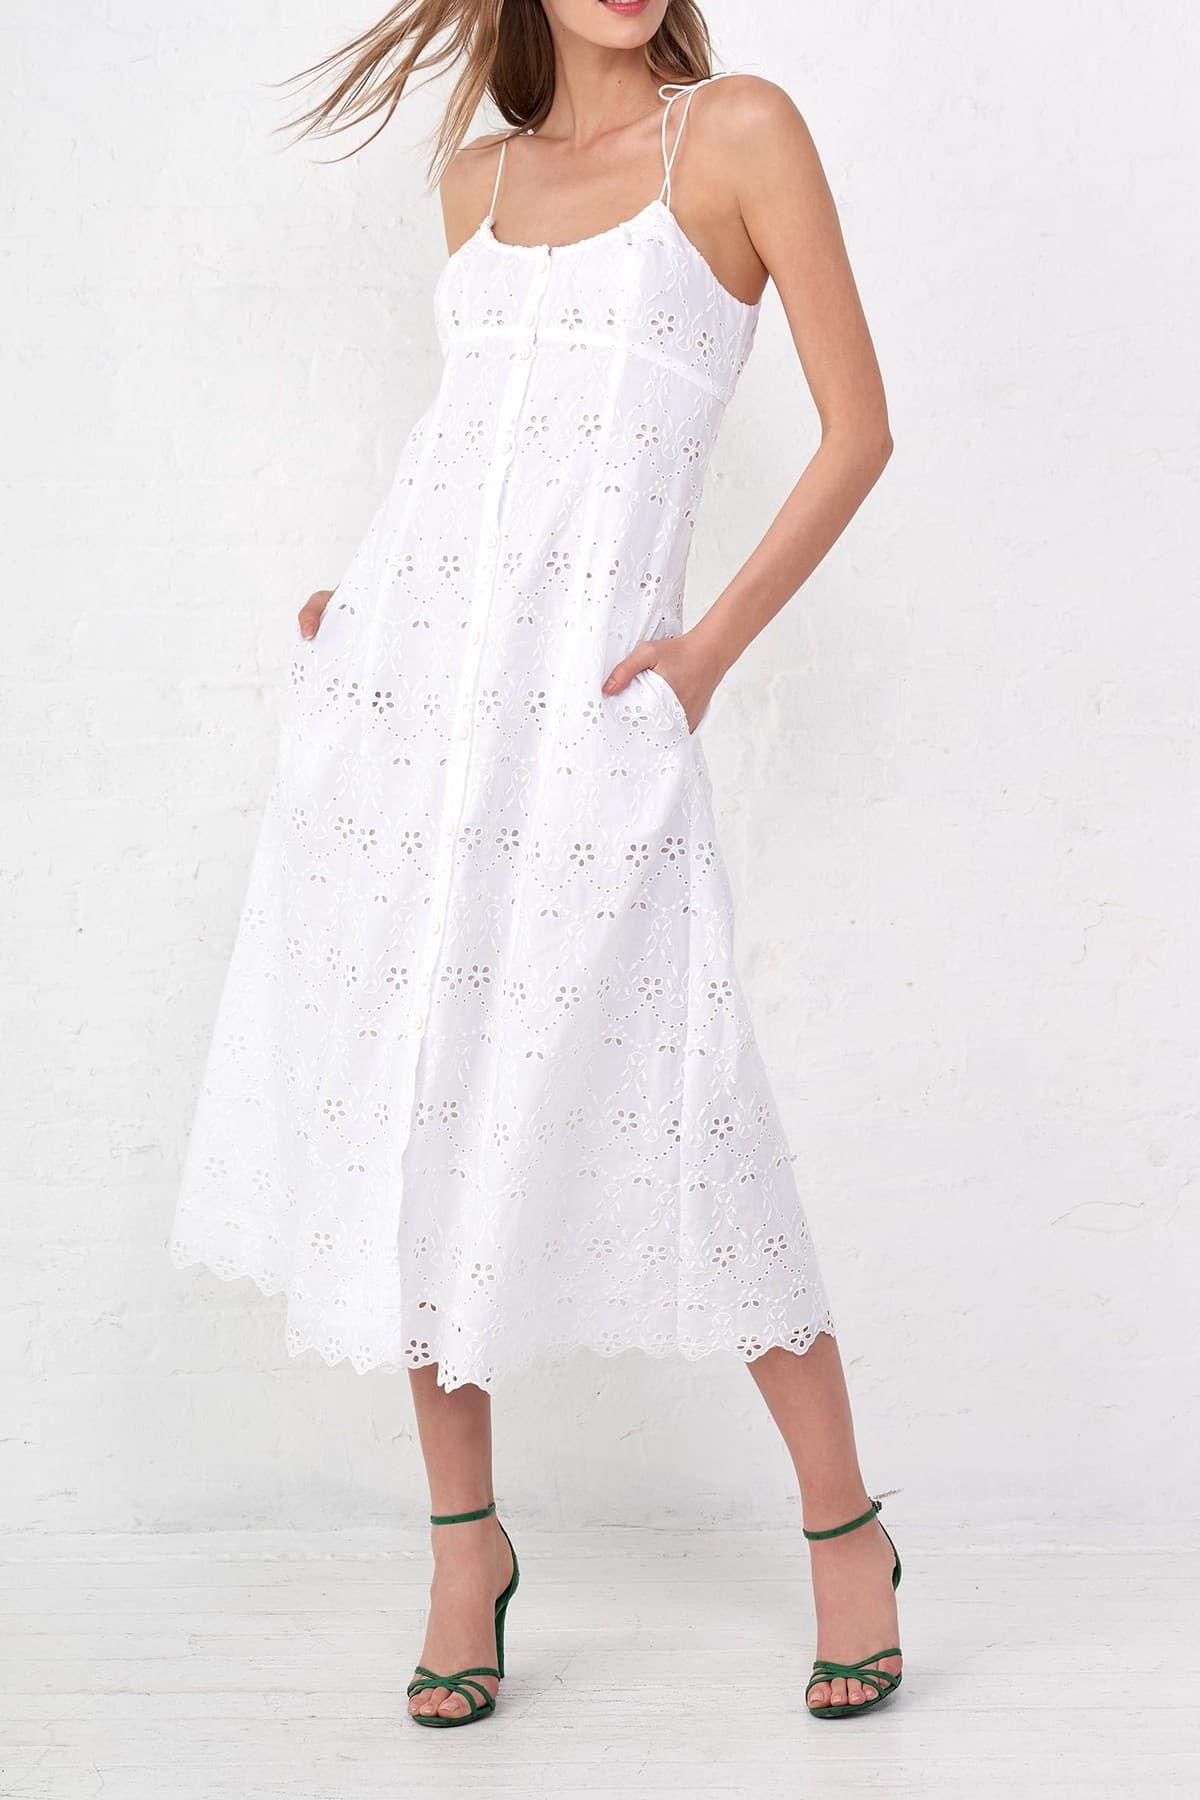 La Ligne Spaghetti Dress Nordstrom Rack In 2021 Dress Spaghetti Dresses White Eyelet Dress [ 1800 x 1200 Pixel ]